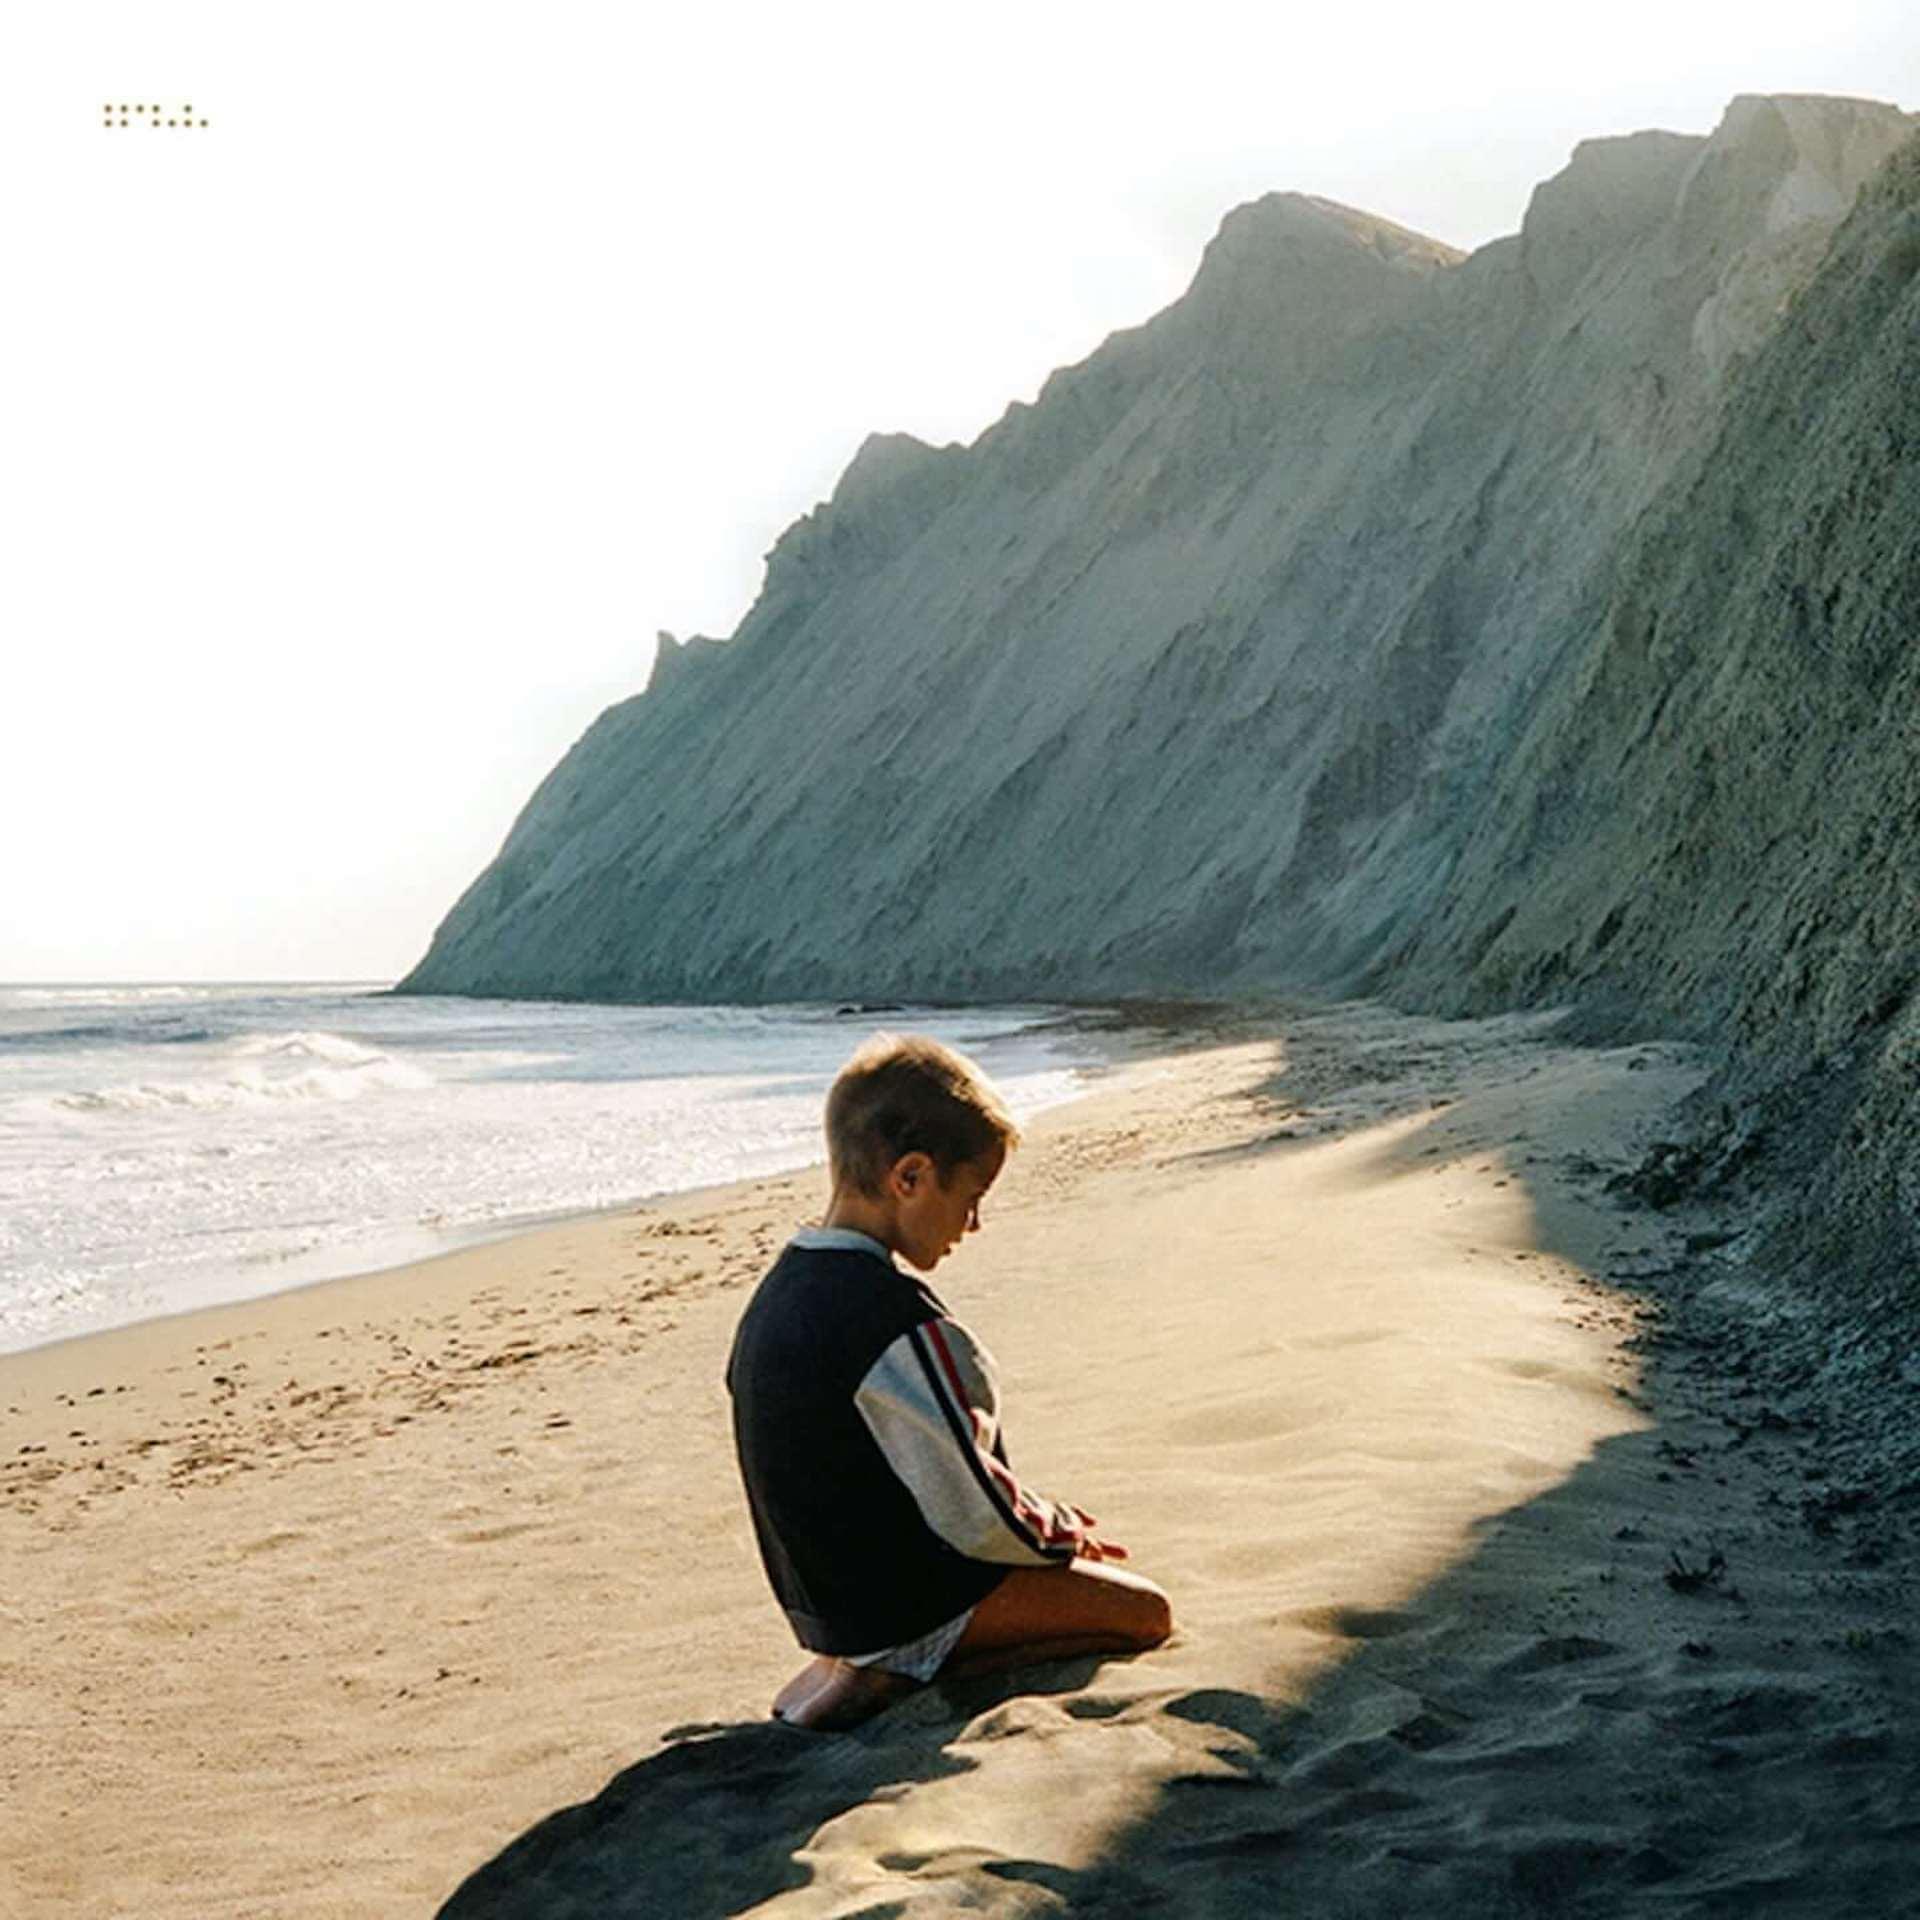 "Tychoの楽曲""For How Long""をHarvey Sutherlandがリミックス!最新作『Weather(Remixes)』より音源が先行解禁 music201126_tycho_5-1920x1920"